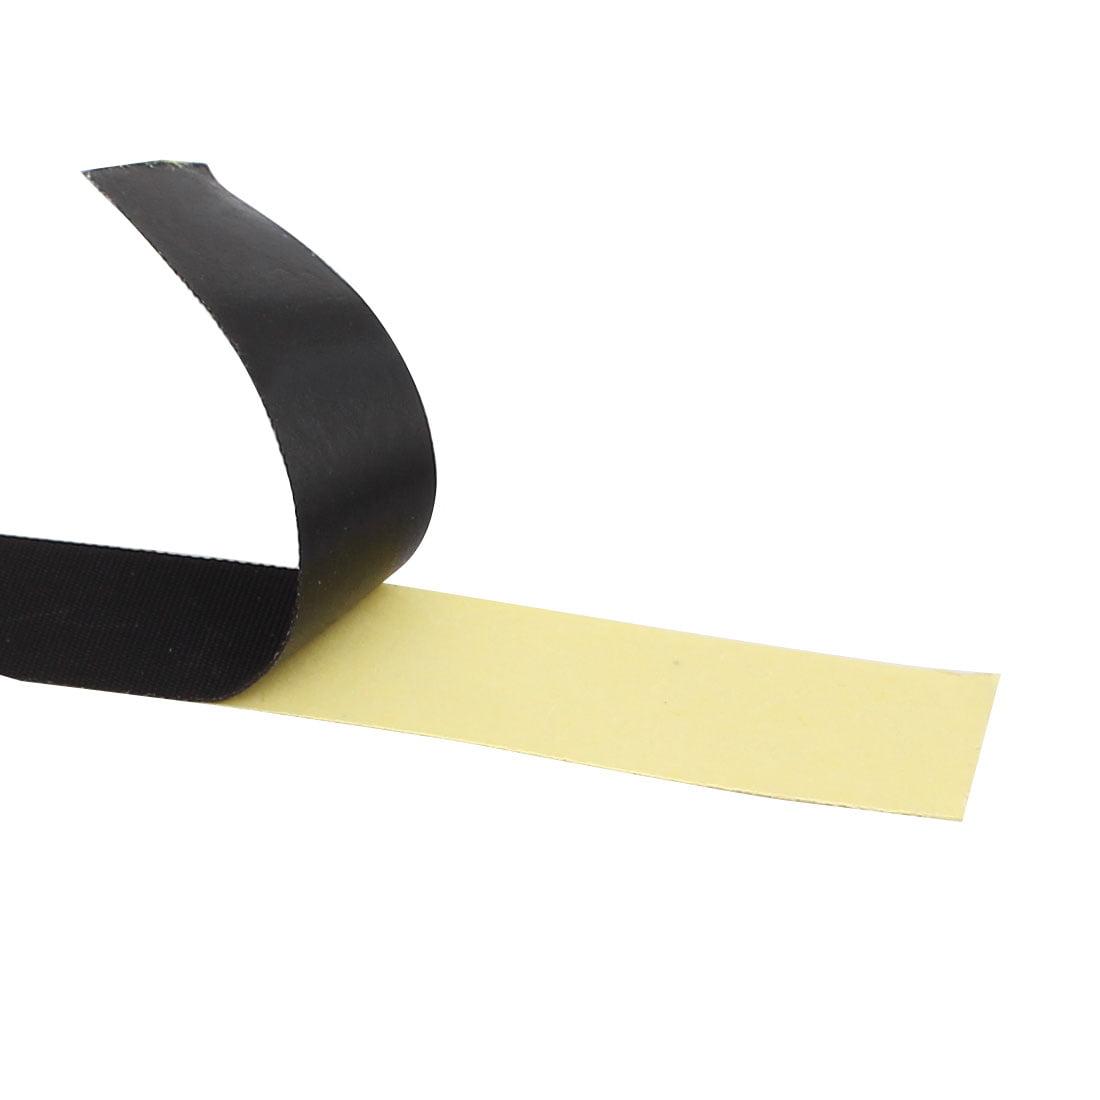 10mm Width Black Insulating Acetate Cloth Adhesive Tape For Laptop Transformer - image 2 de 3